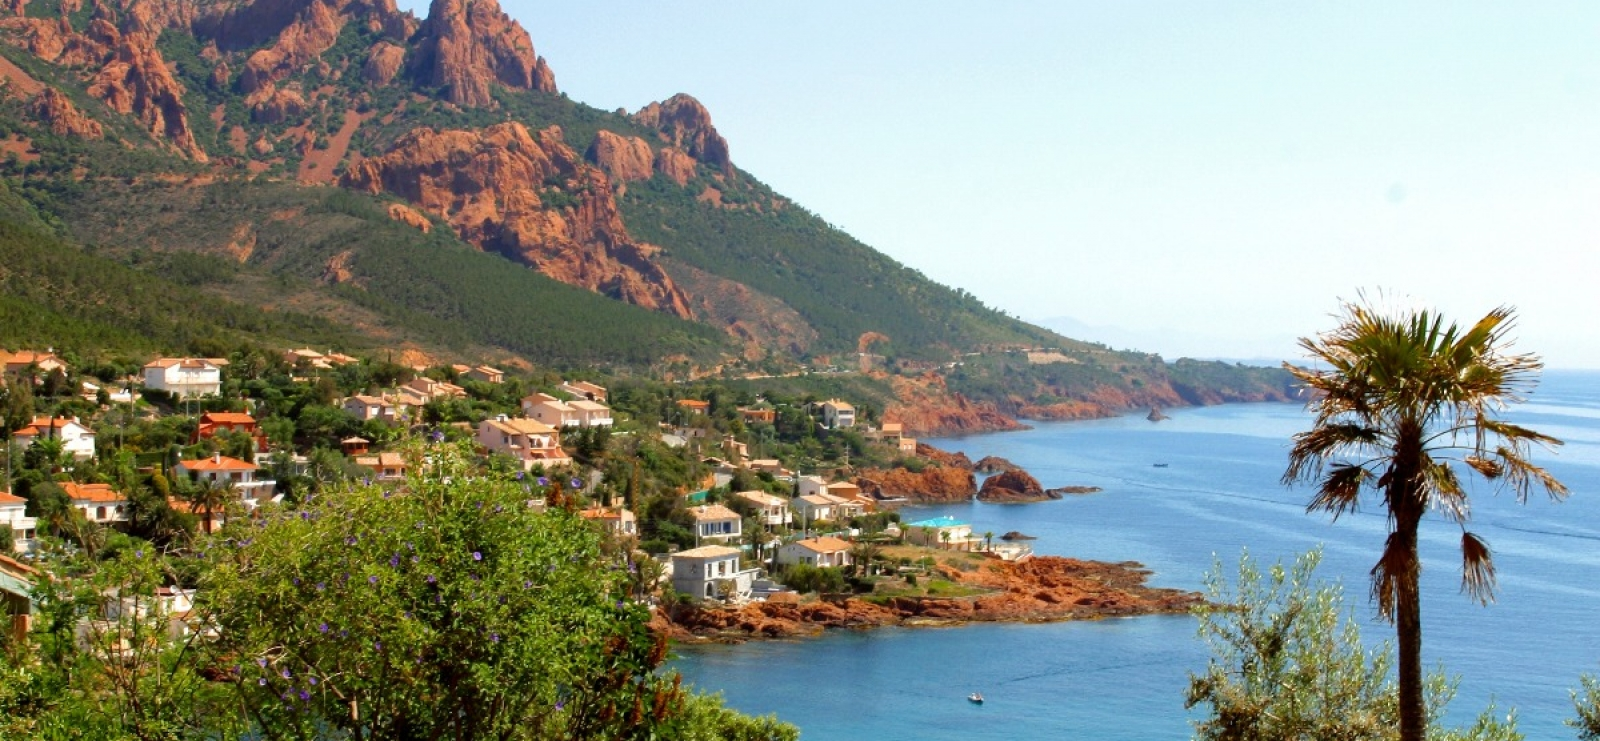 Groupes-Mer-nature-Tour-bus-Demi-journee